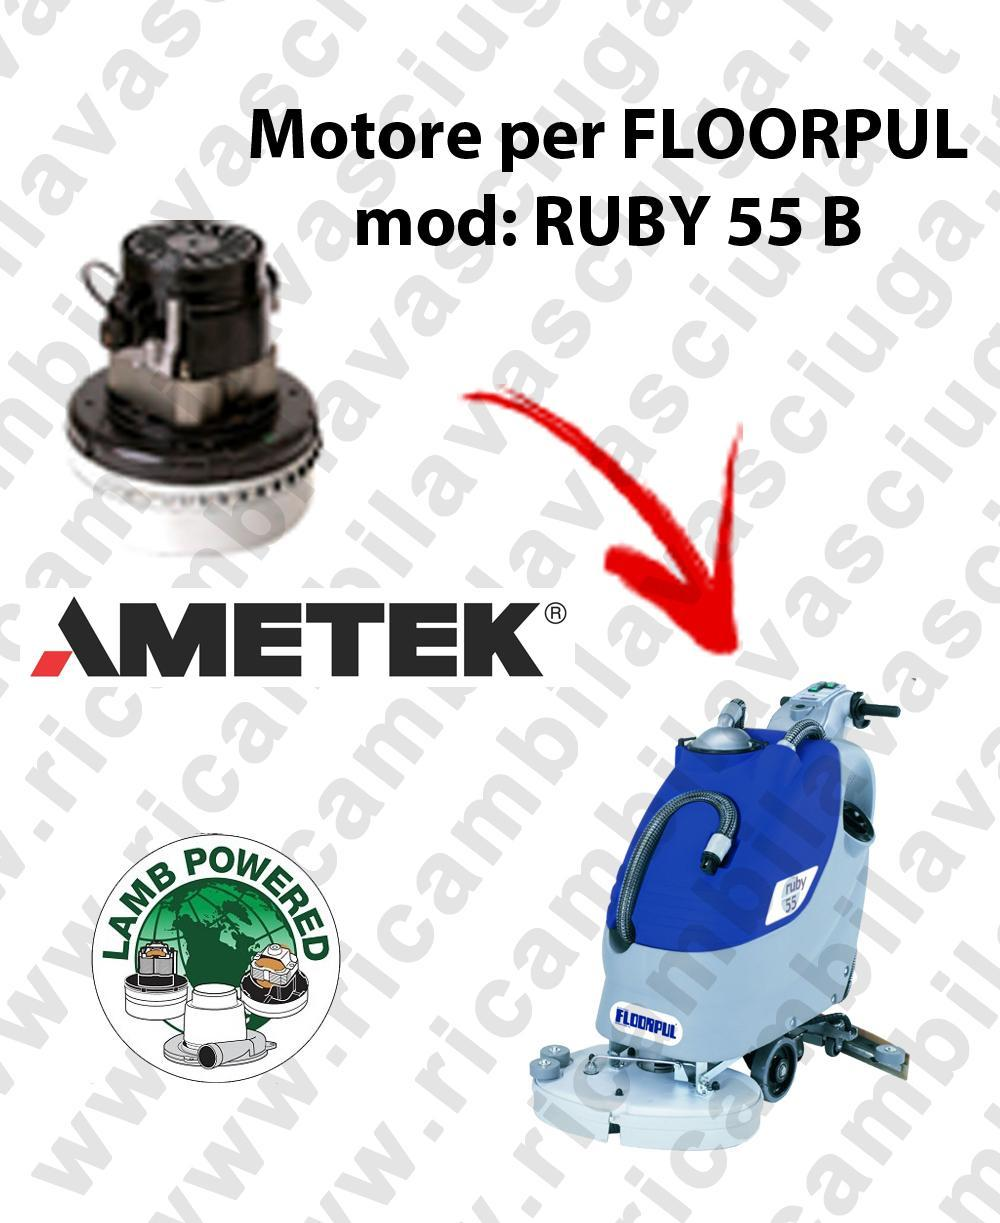 RUBY 55 B Saugmotor LAMB AMETEK für scheuersaugmaschinen FLOORPUL